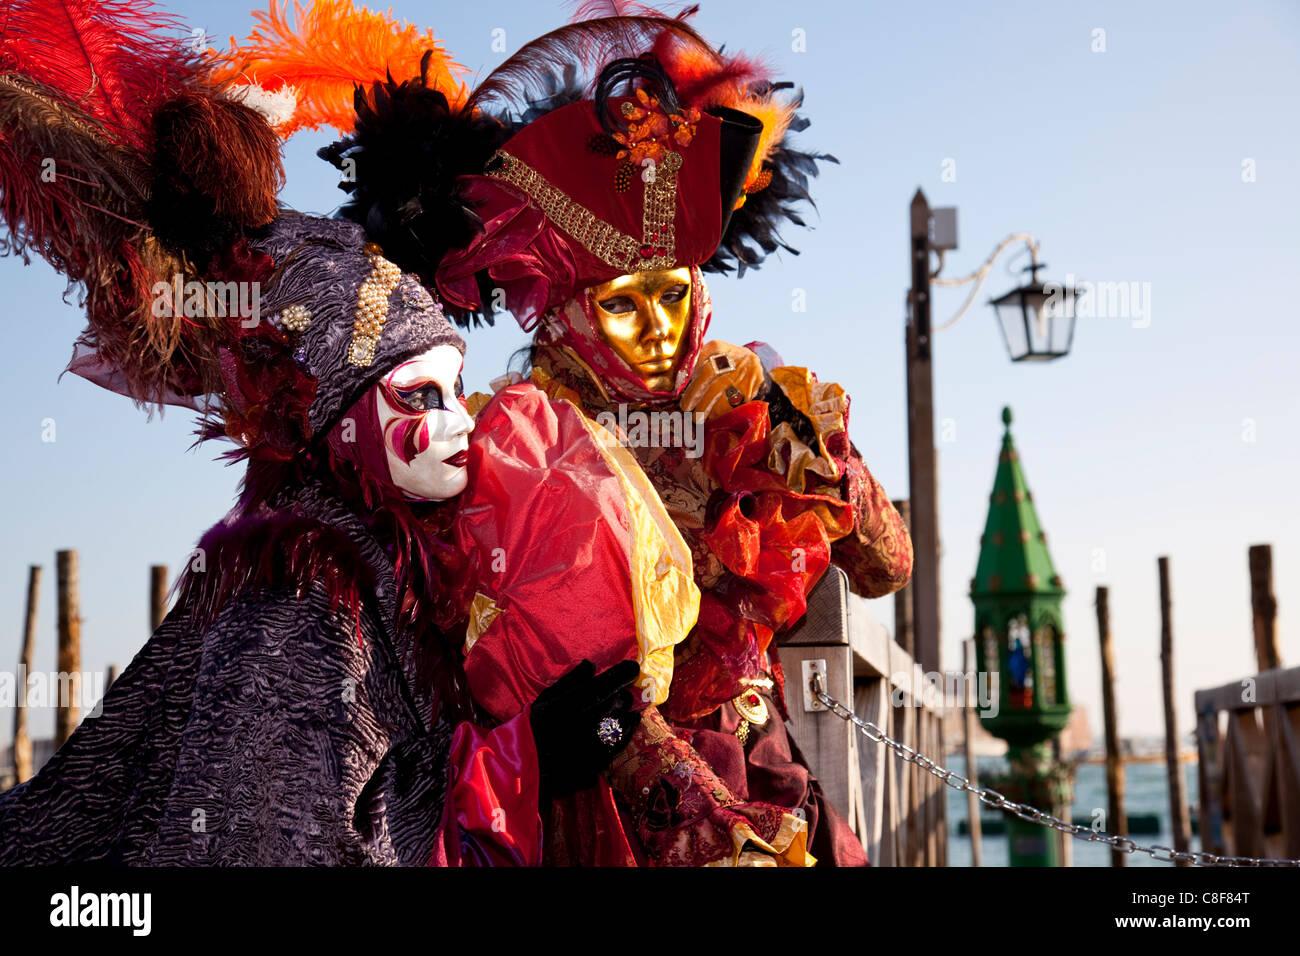 Costumes and masks during Venice Carnival, Venice, Veneto, Italy Stock Photo